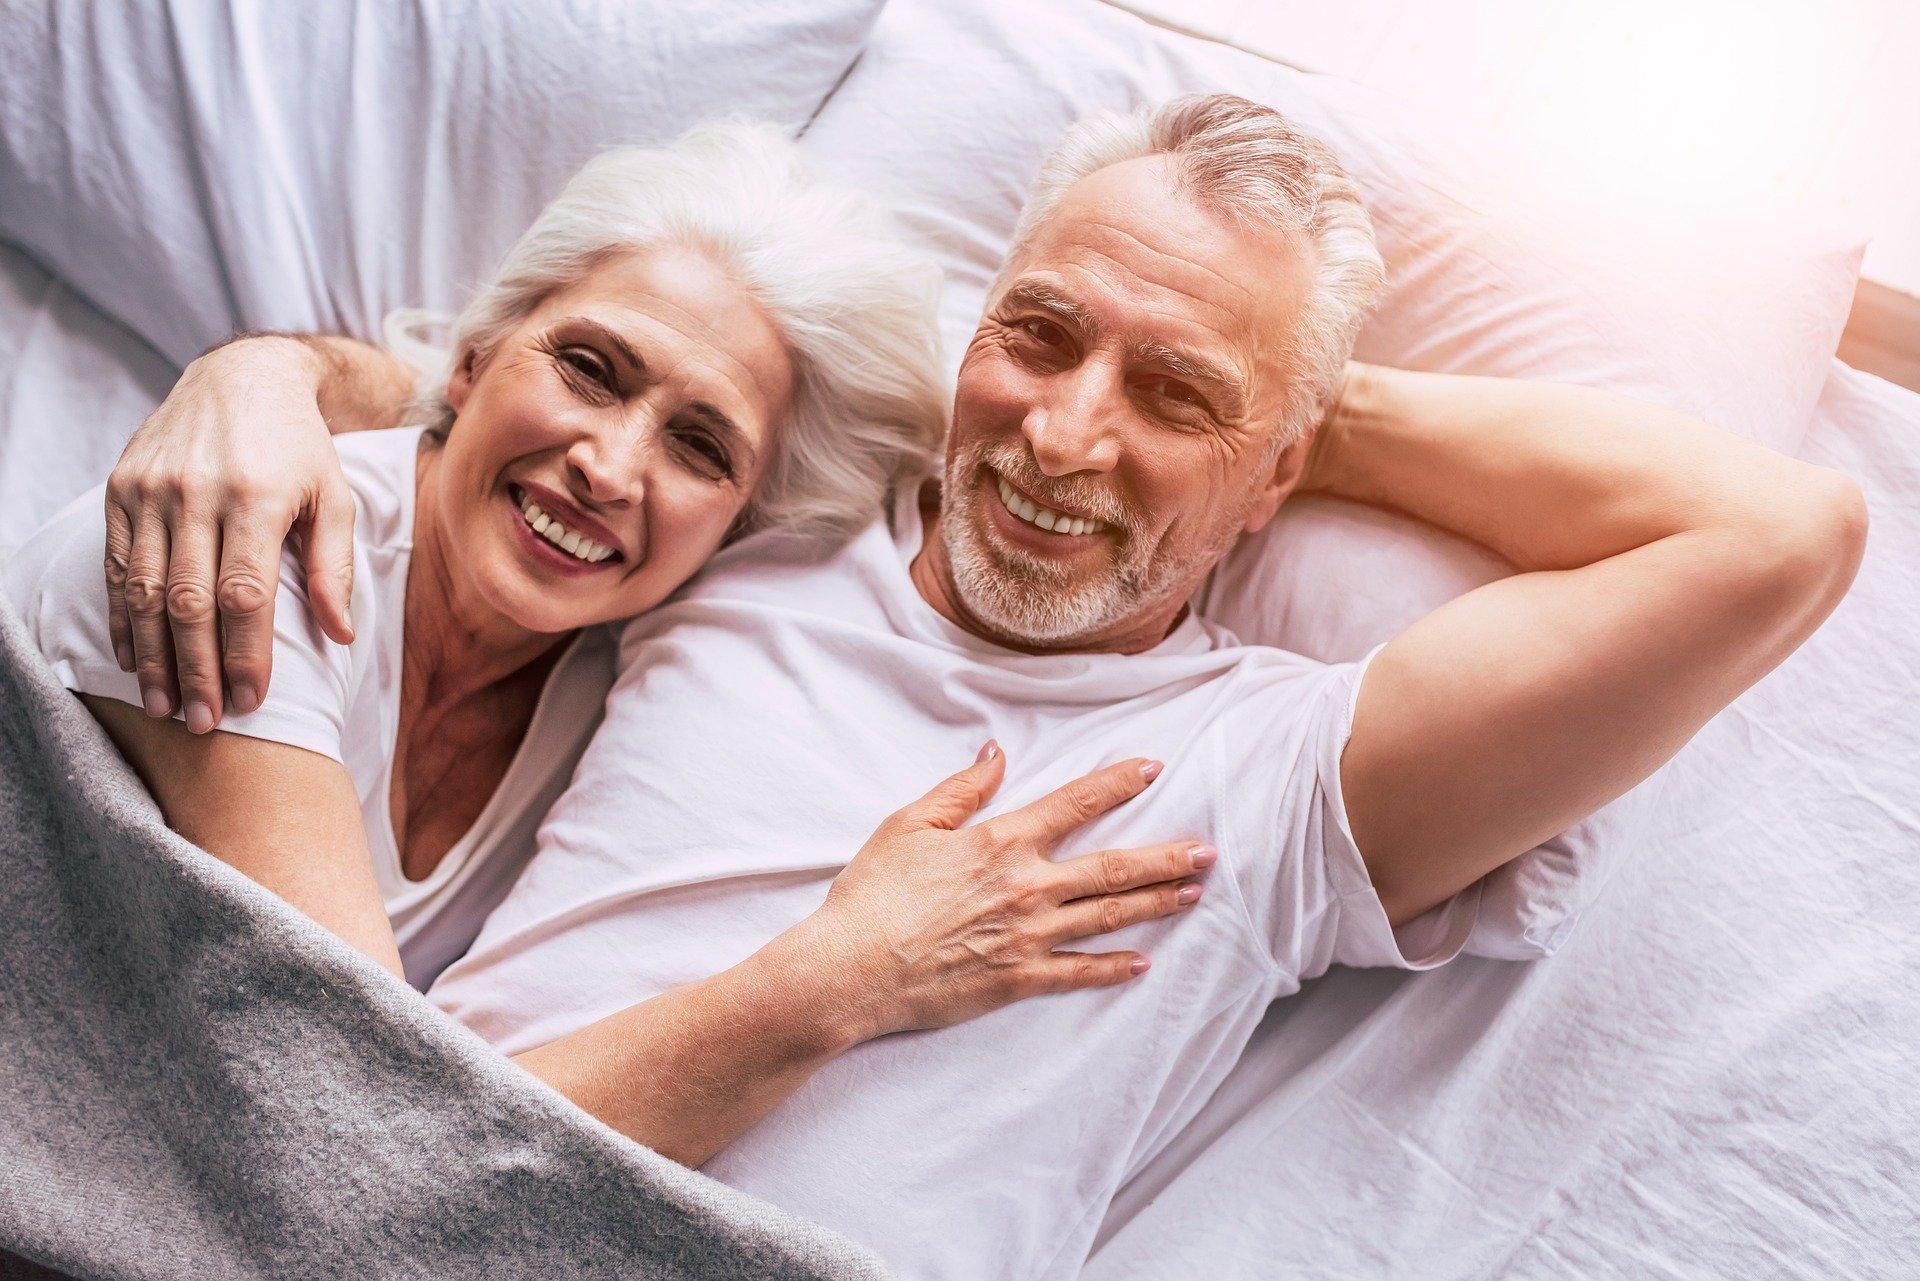 Adapter sa vie sexuelle durant la ménopause